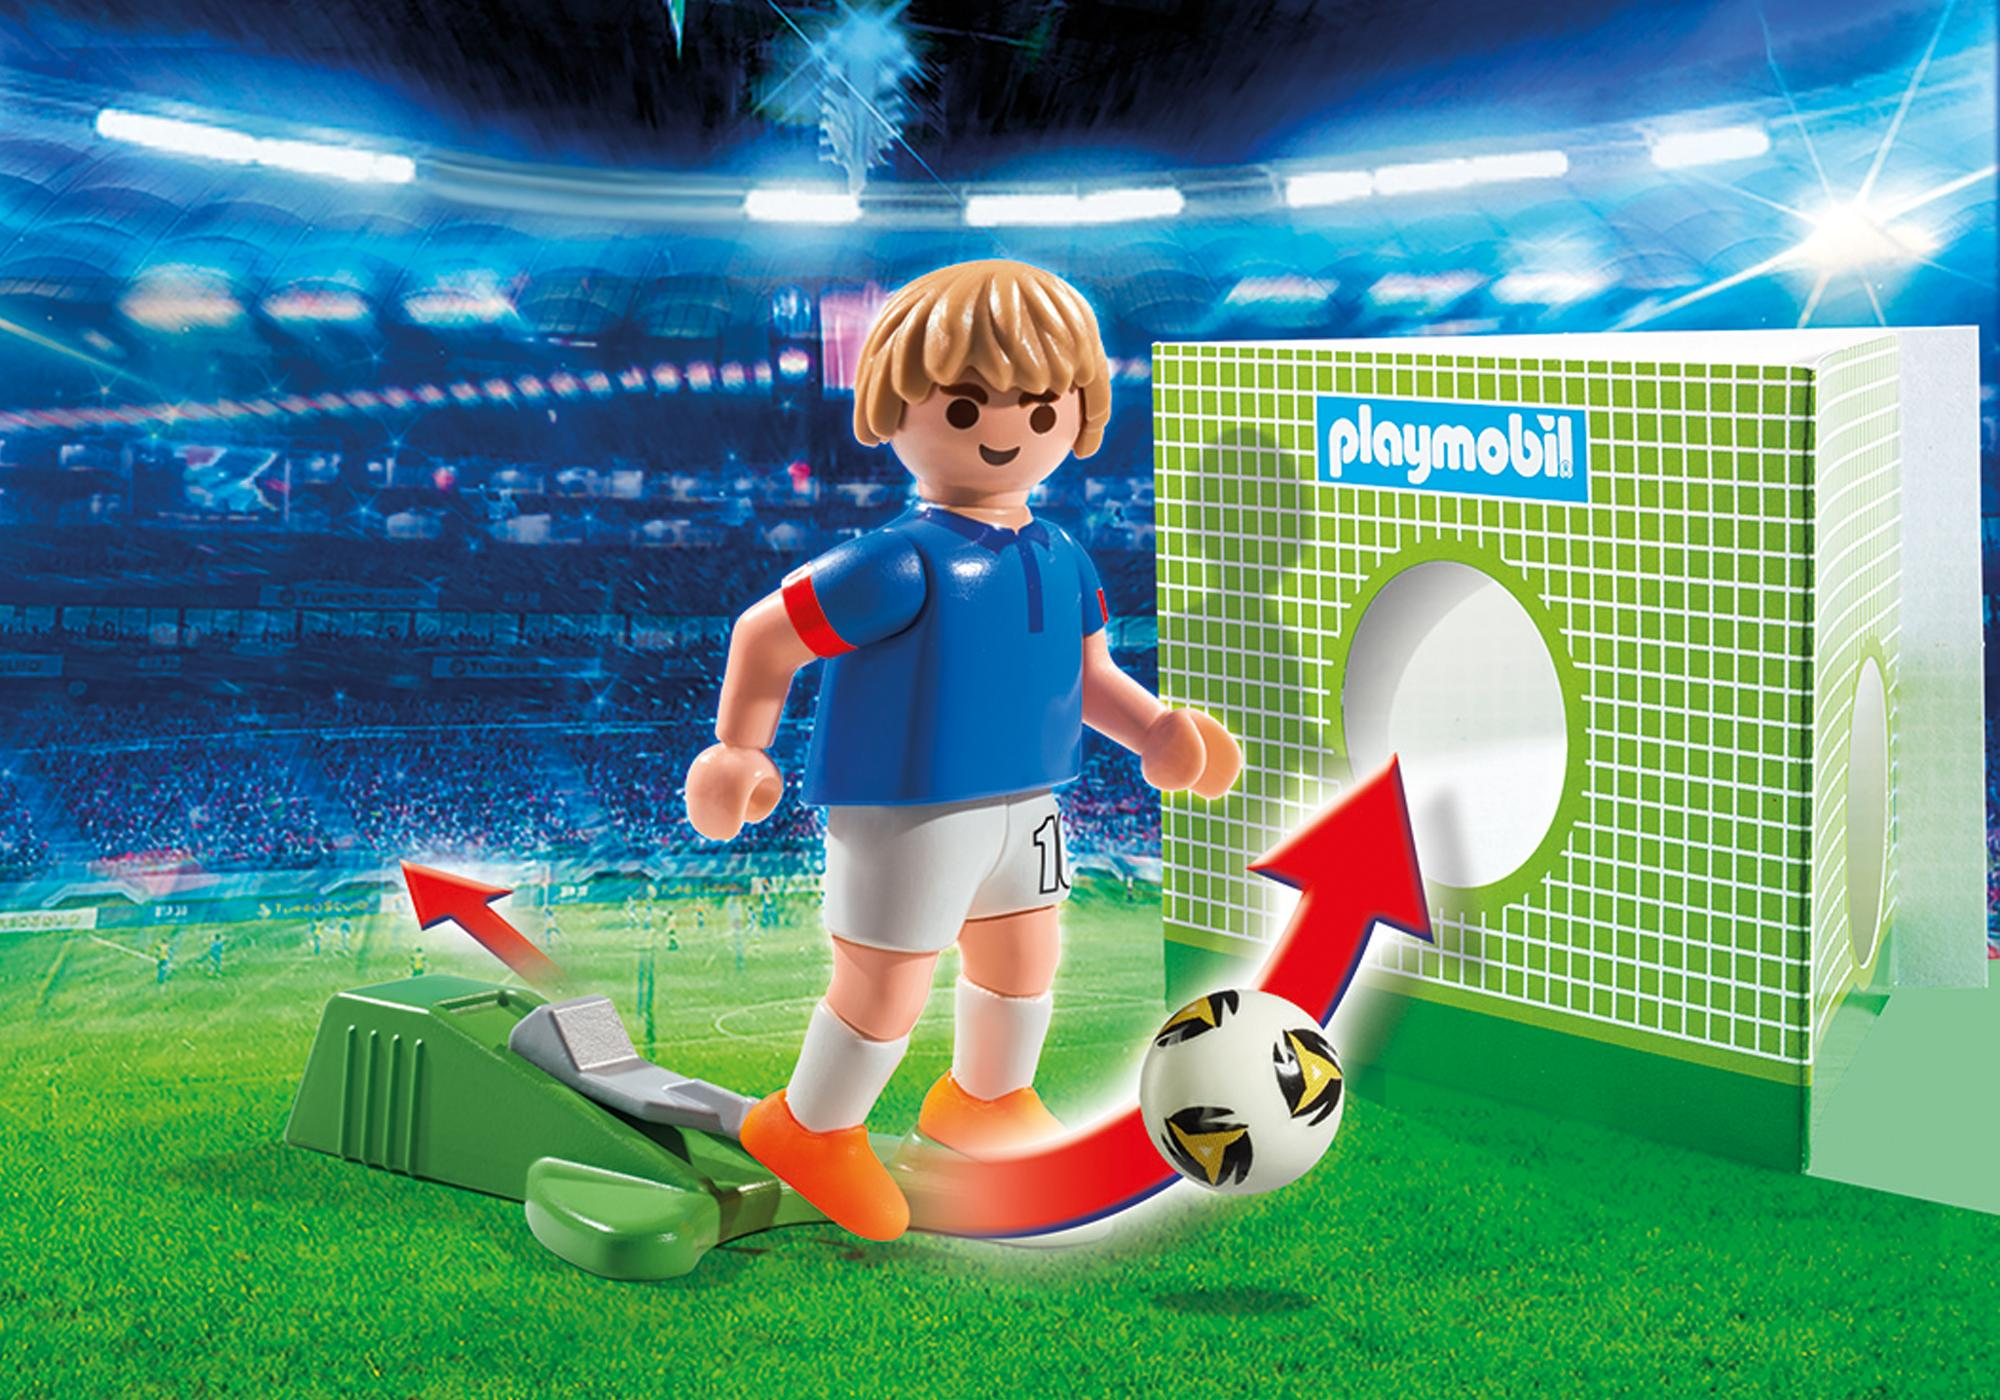 http://media.playmobil.com/i/playmobil/6894_product_detail/Fußballspieler Frankreich